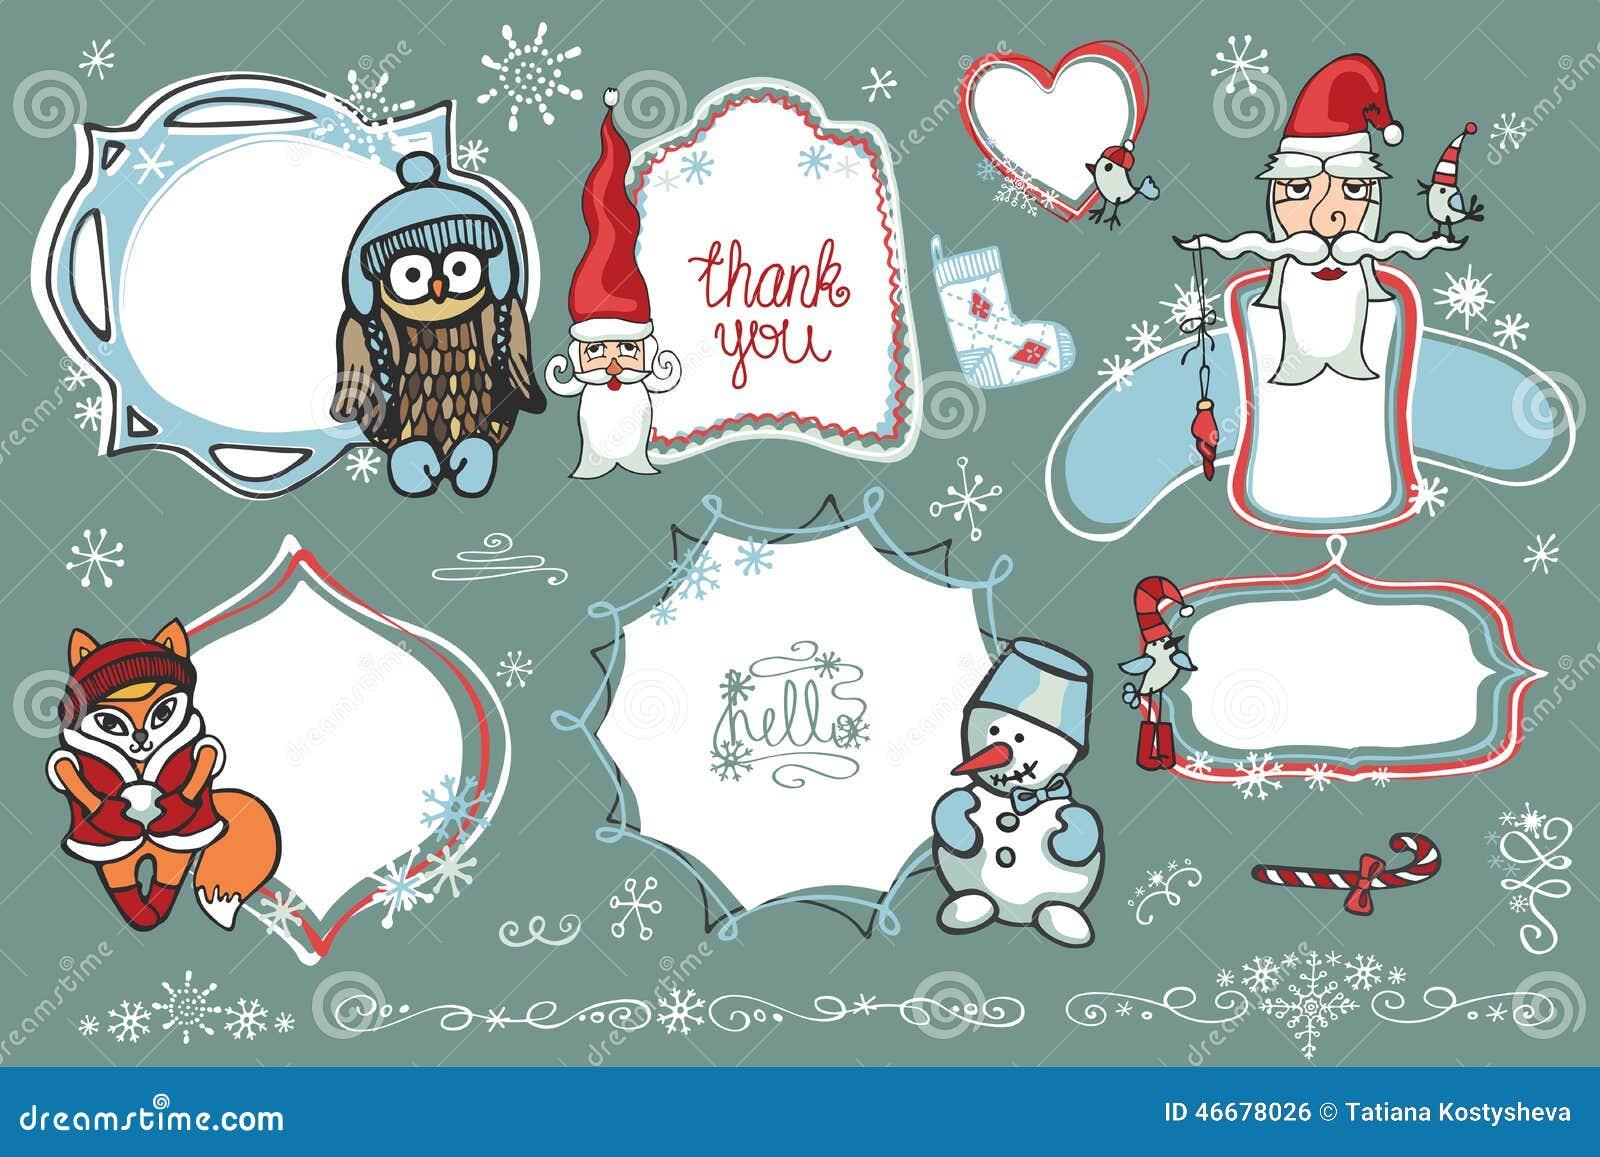 humor christmasnew year setfor design templatesinvitationscard childrens hand drawing style winter vector